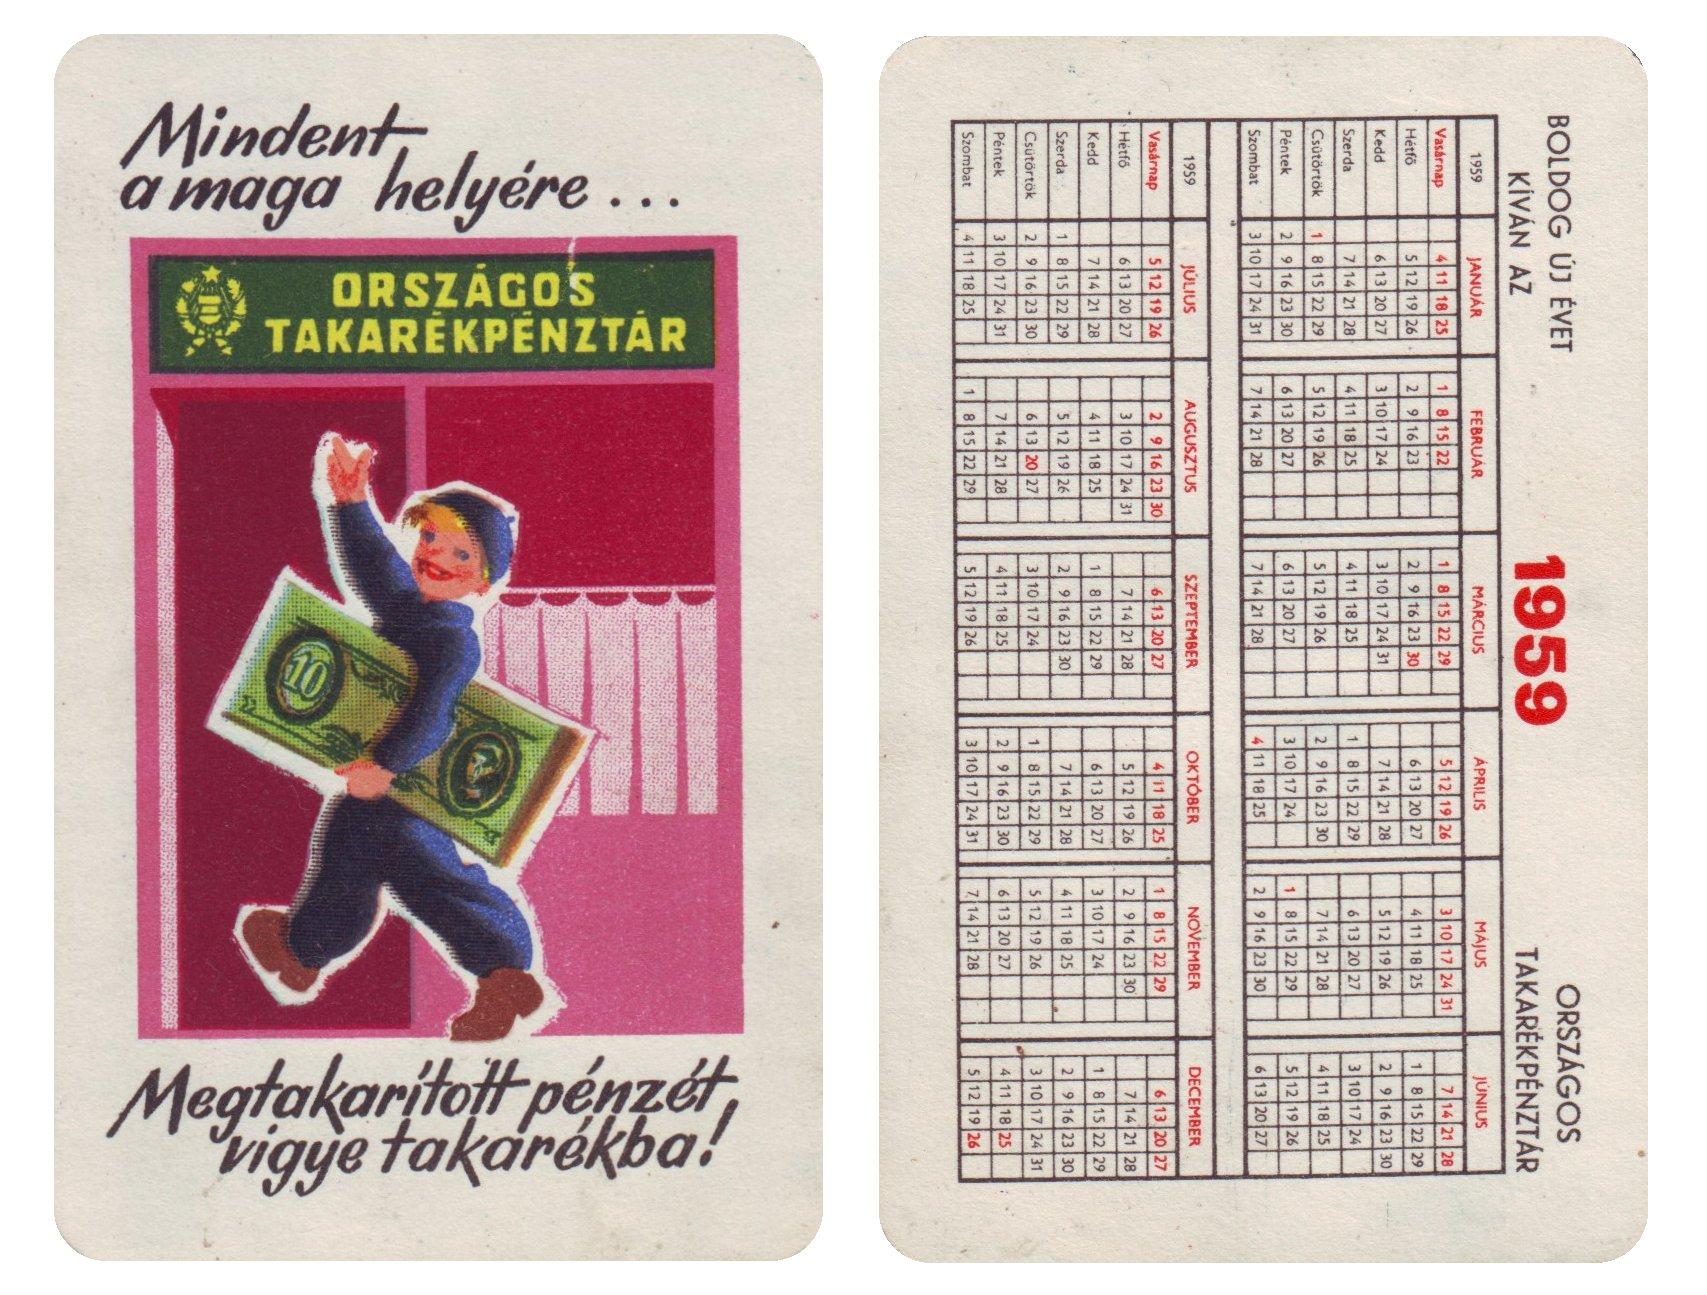 http://www.forintportal.hu/kartyanaptar/www_forintportal_hu_1959_kartyanaptar_022_nagy.jpg